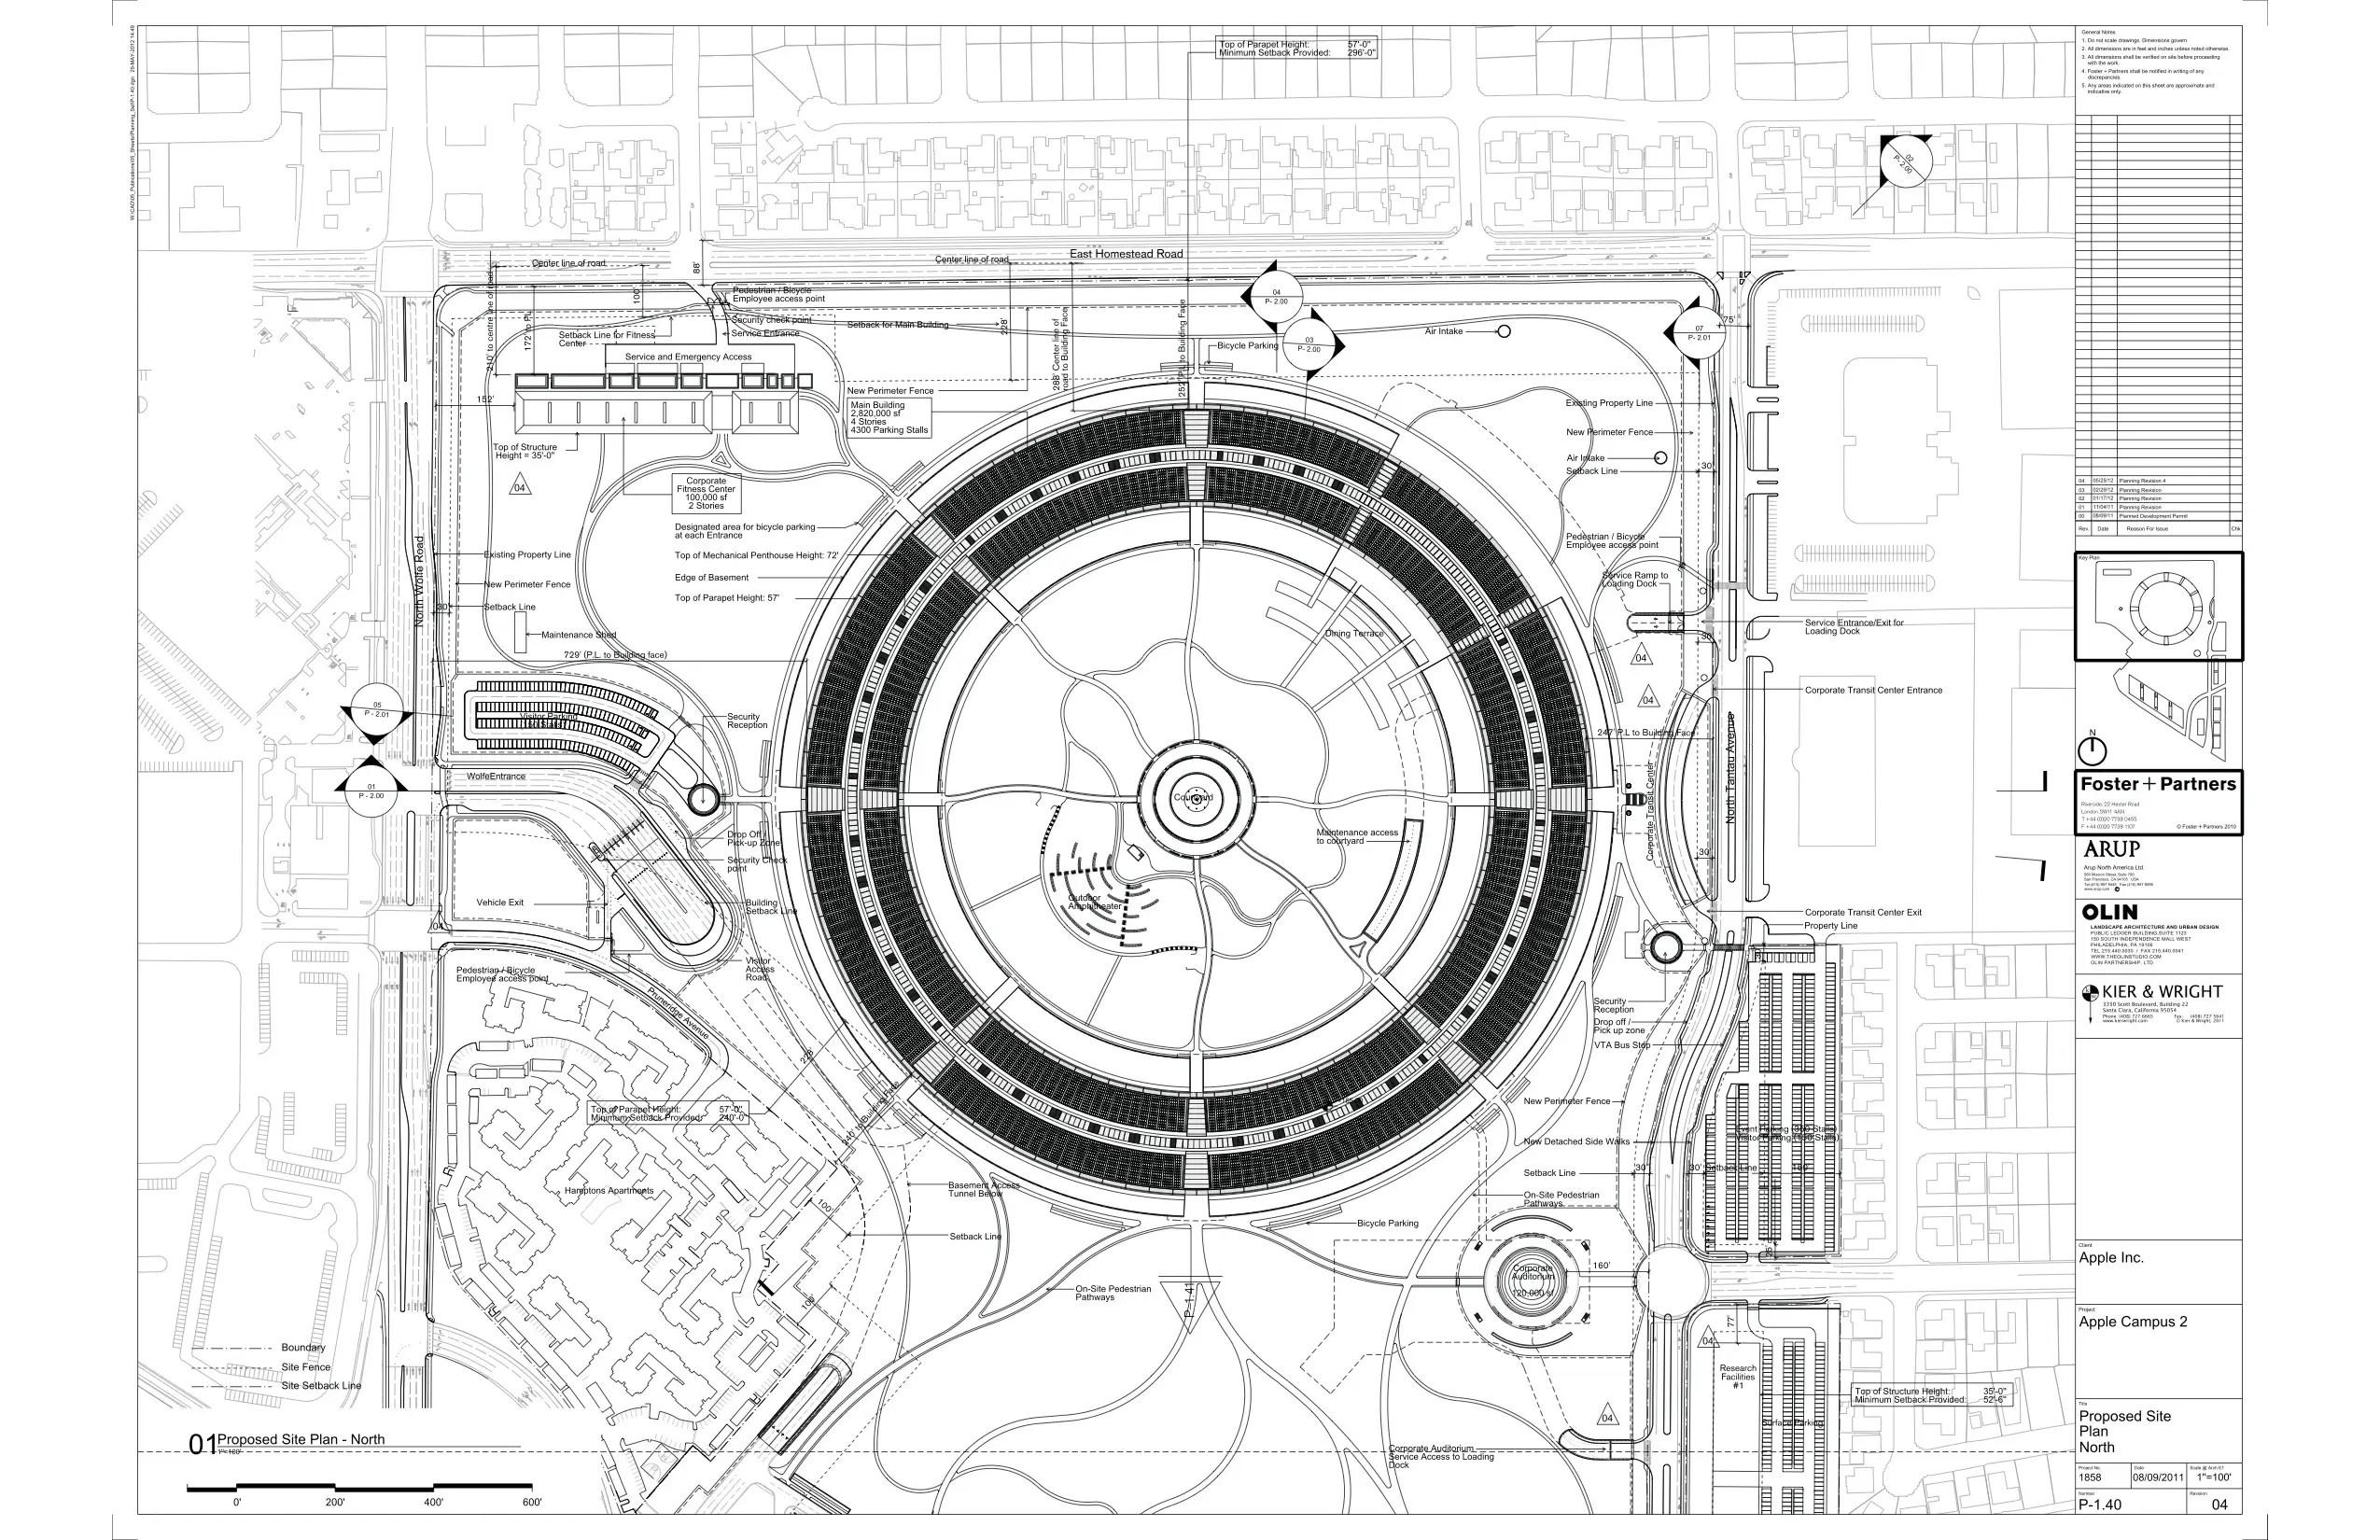 Brand New Pictures Of Apple S Amazing Spaceship Campus